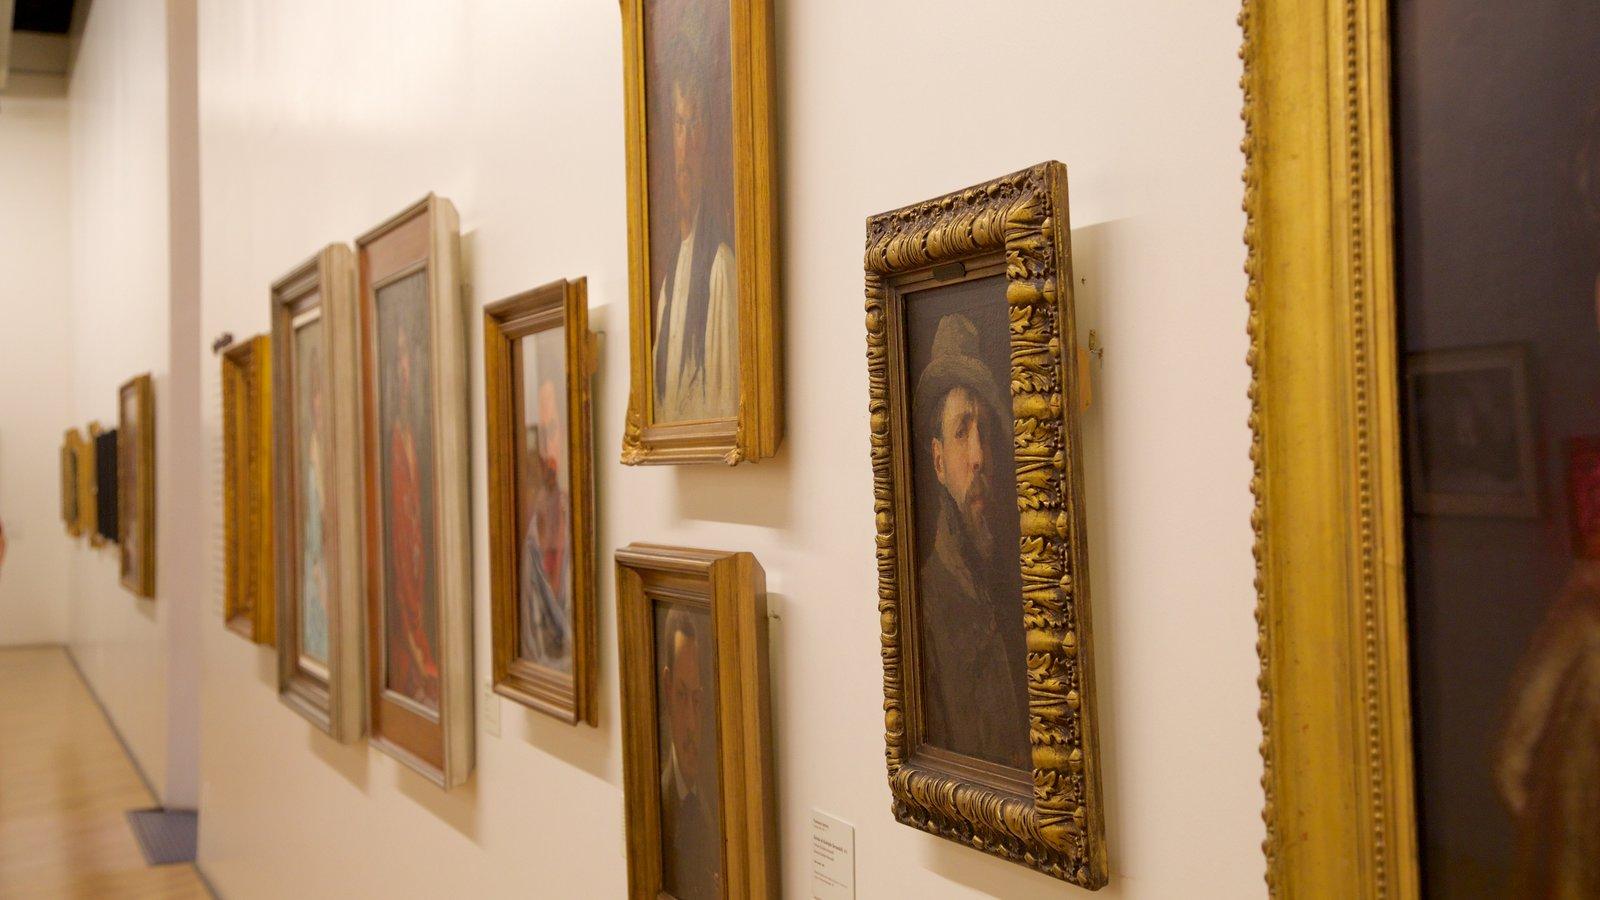 Pinacoteca do Estado caracterizando vistas internas e arte